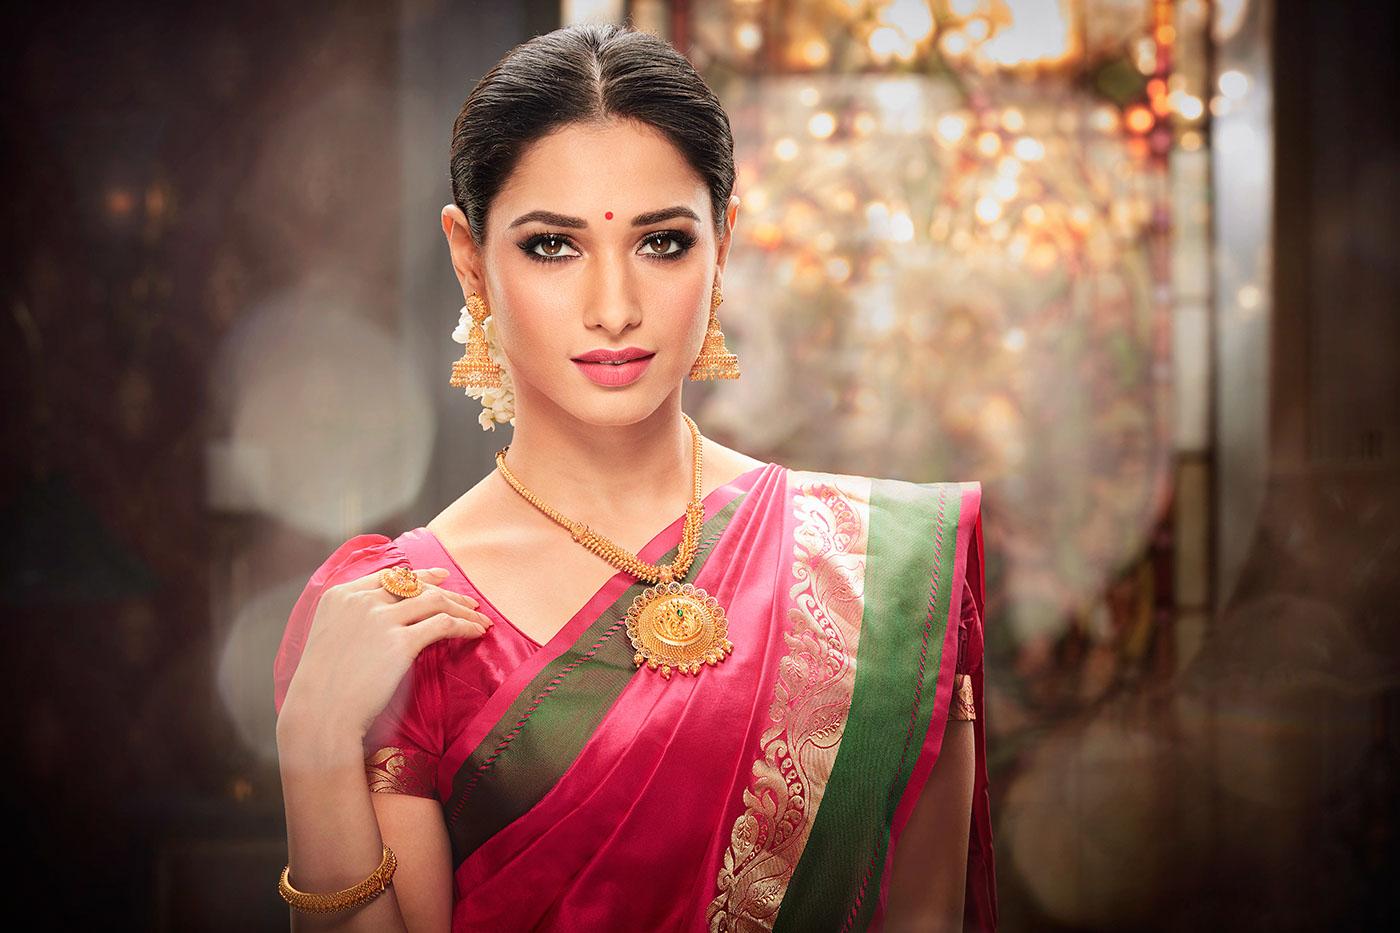 Tamanna Bhatia In Saree Wallpaper: Malabar Gold And Diamonds Jewellery On Behance